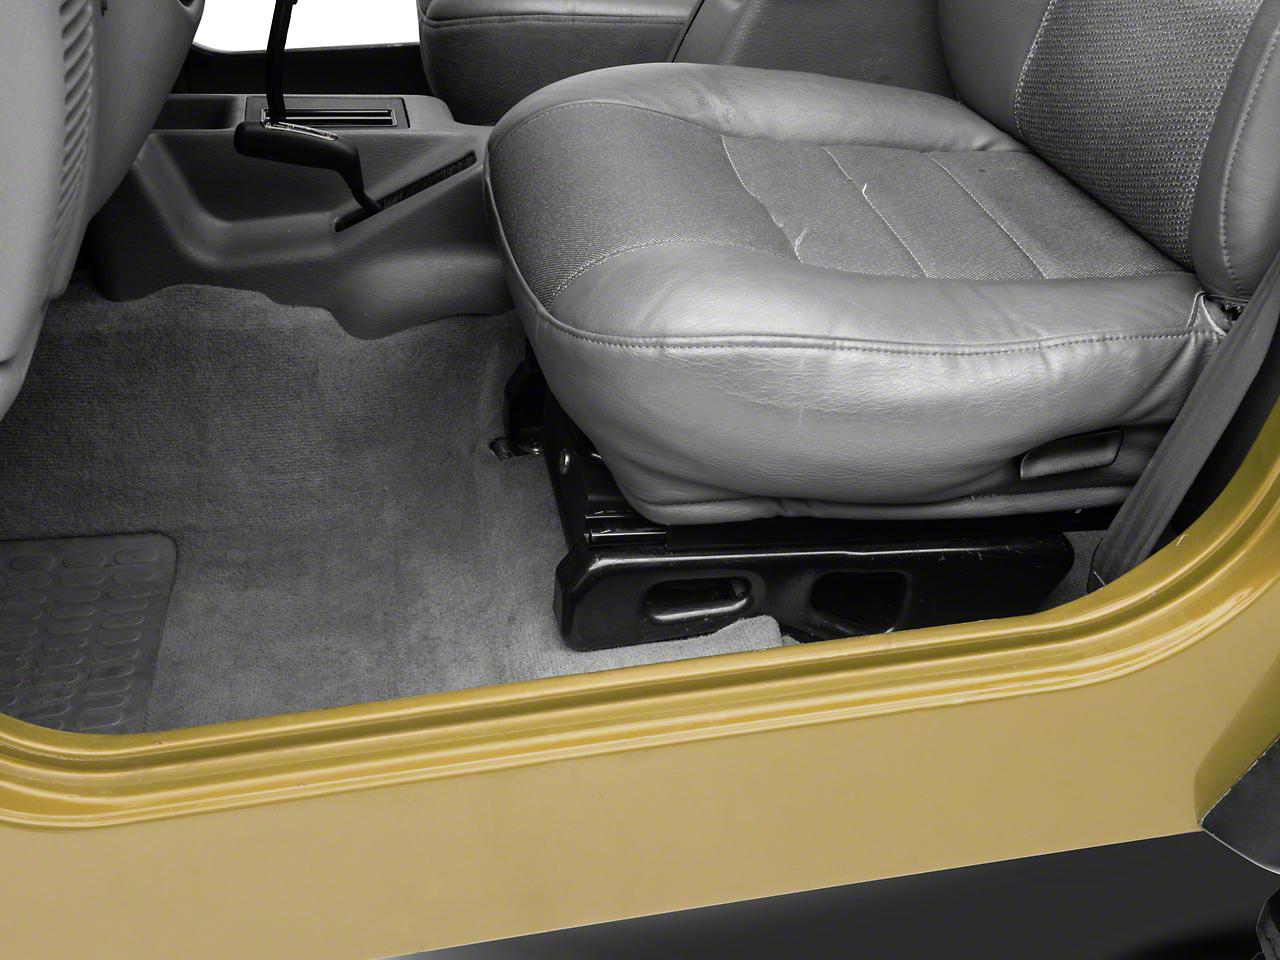 Bestop Underseat Storage Lock Box - Driver Side (97-06 Jeep Wrangler TJ)